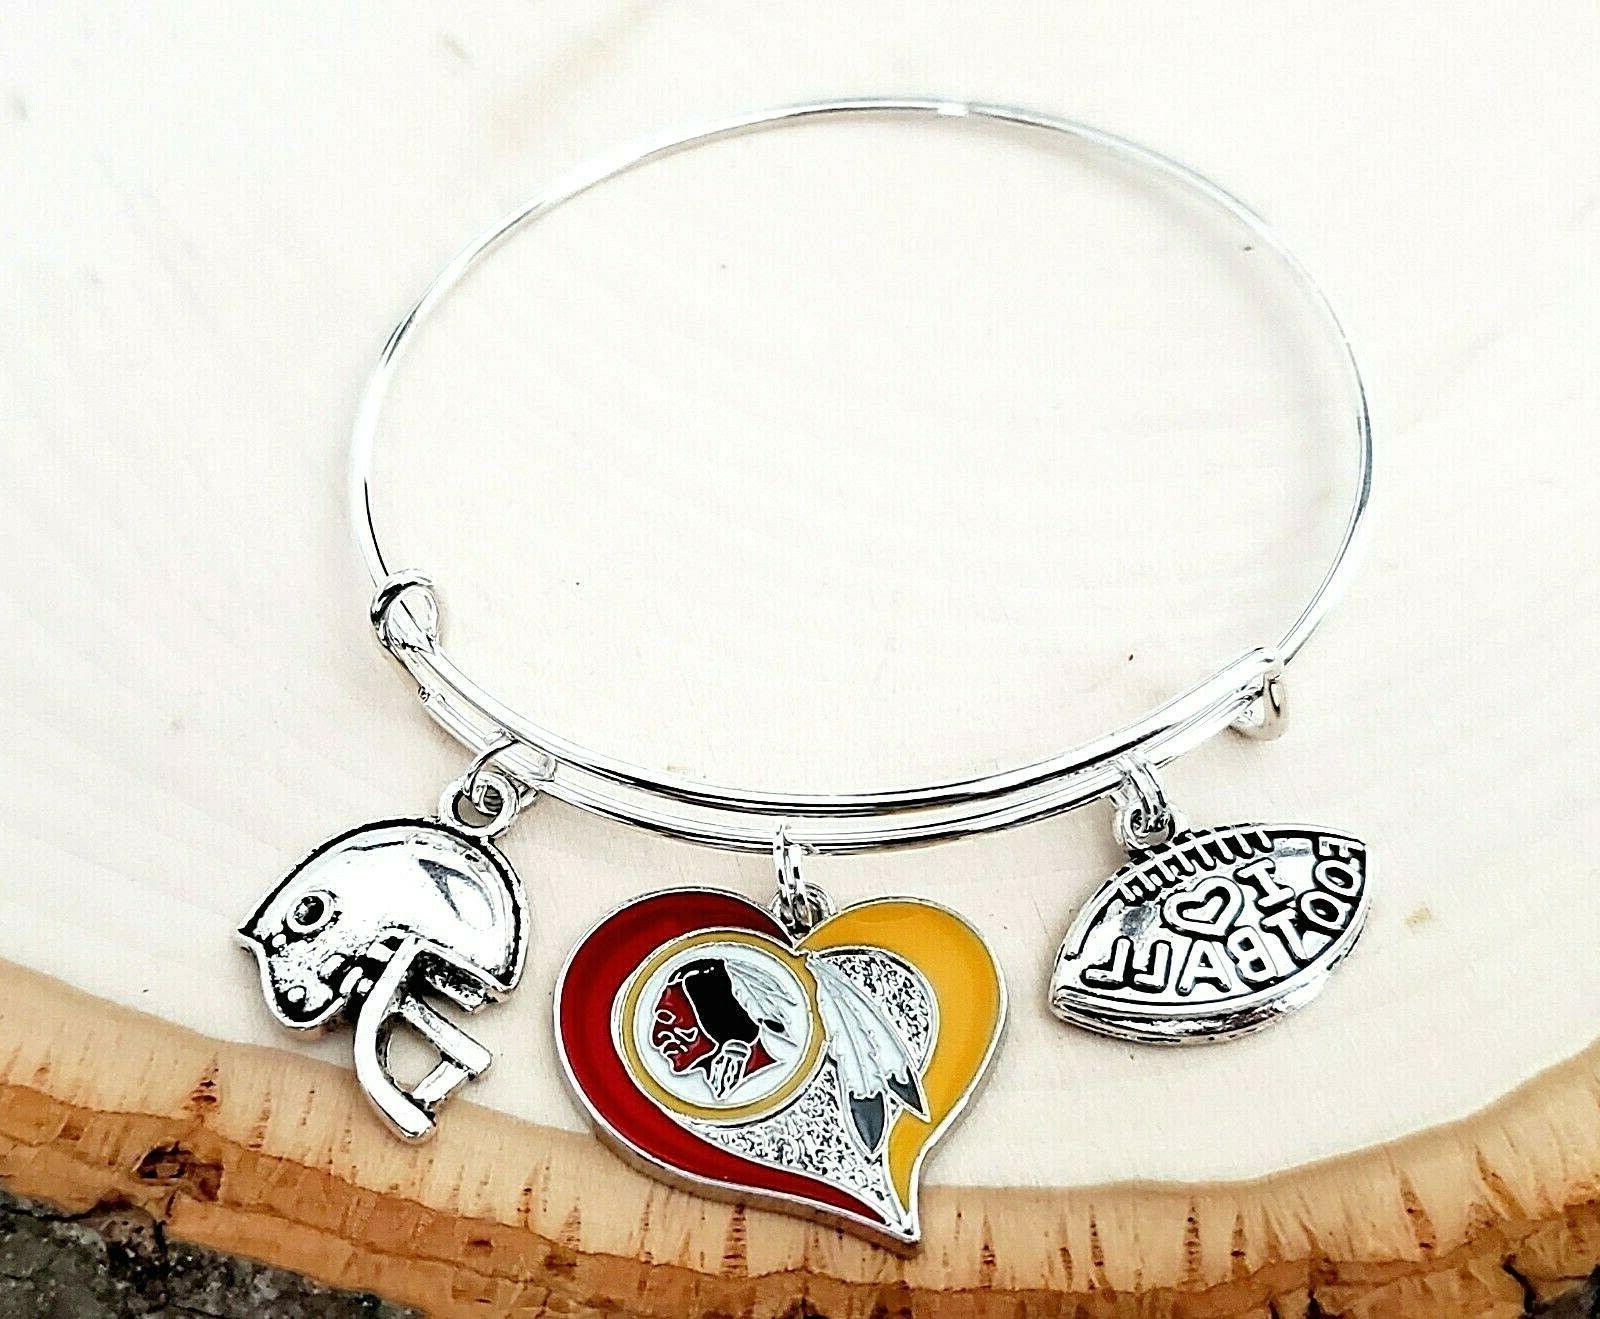 washington redskins nfl heart charm logo bracelet